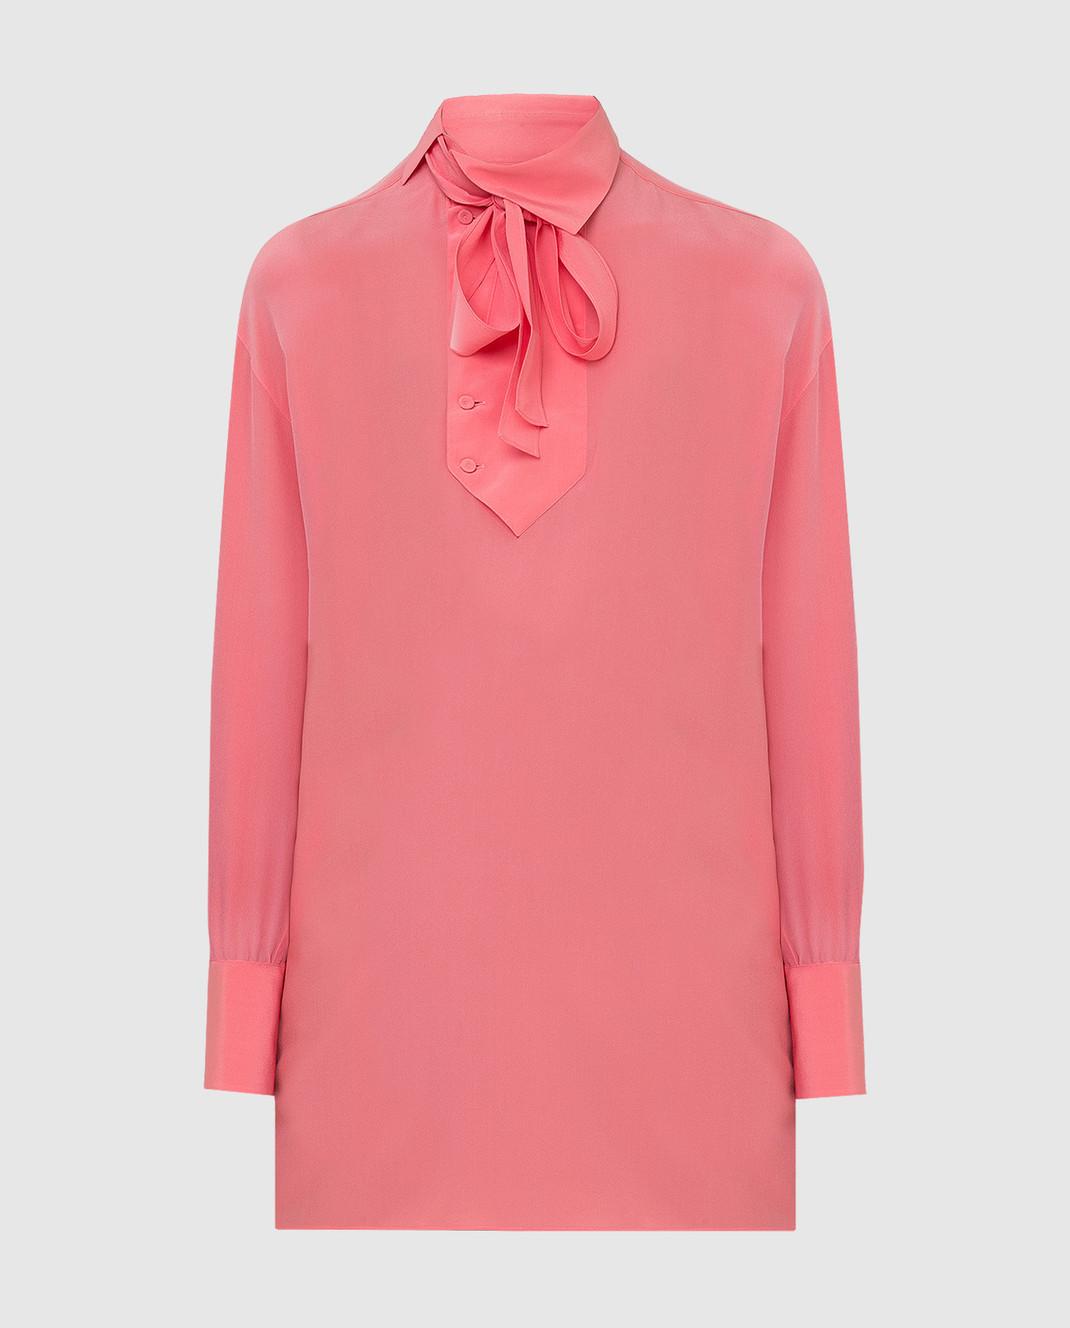 Valentino Коралловая блуза из шелка MB0AB08F21B